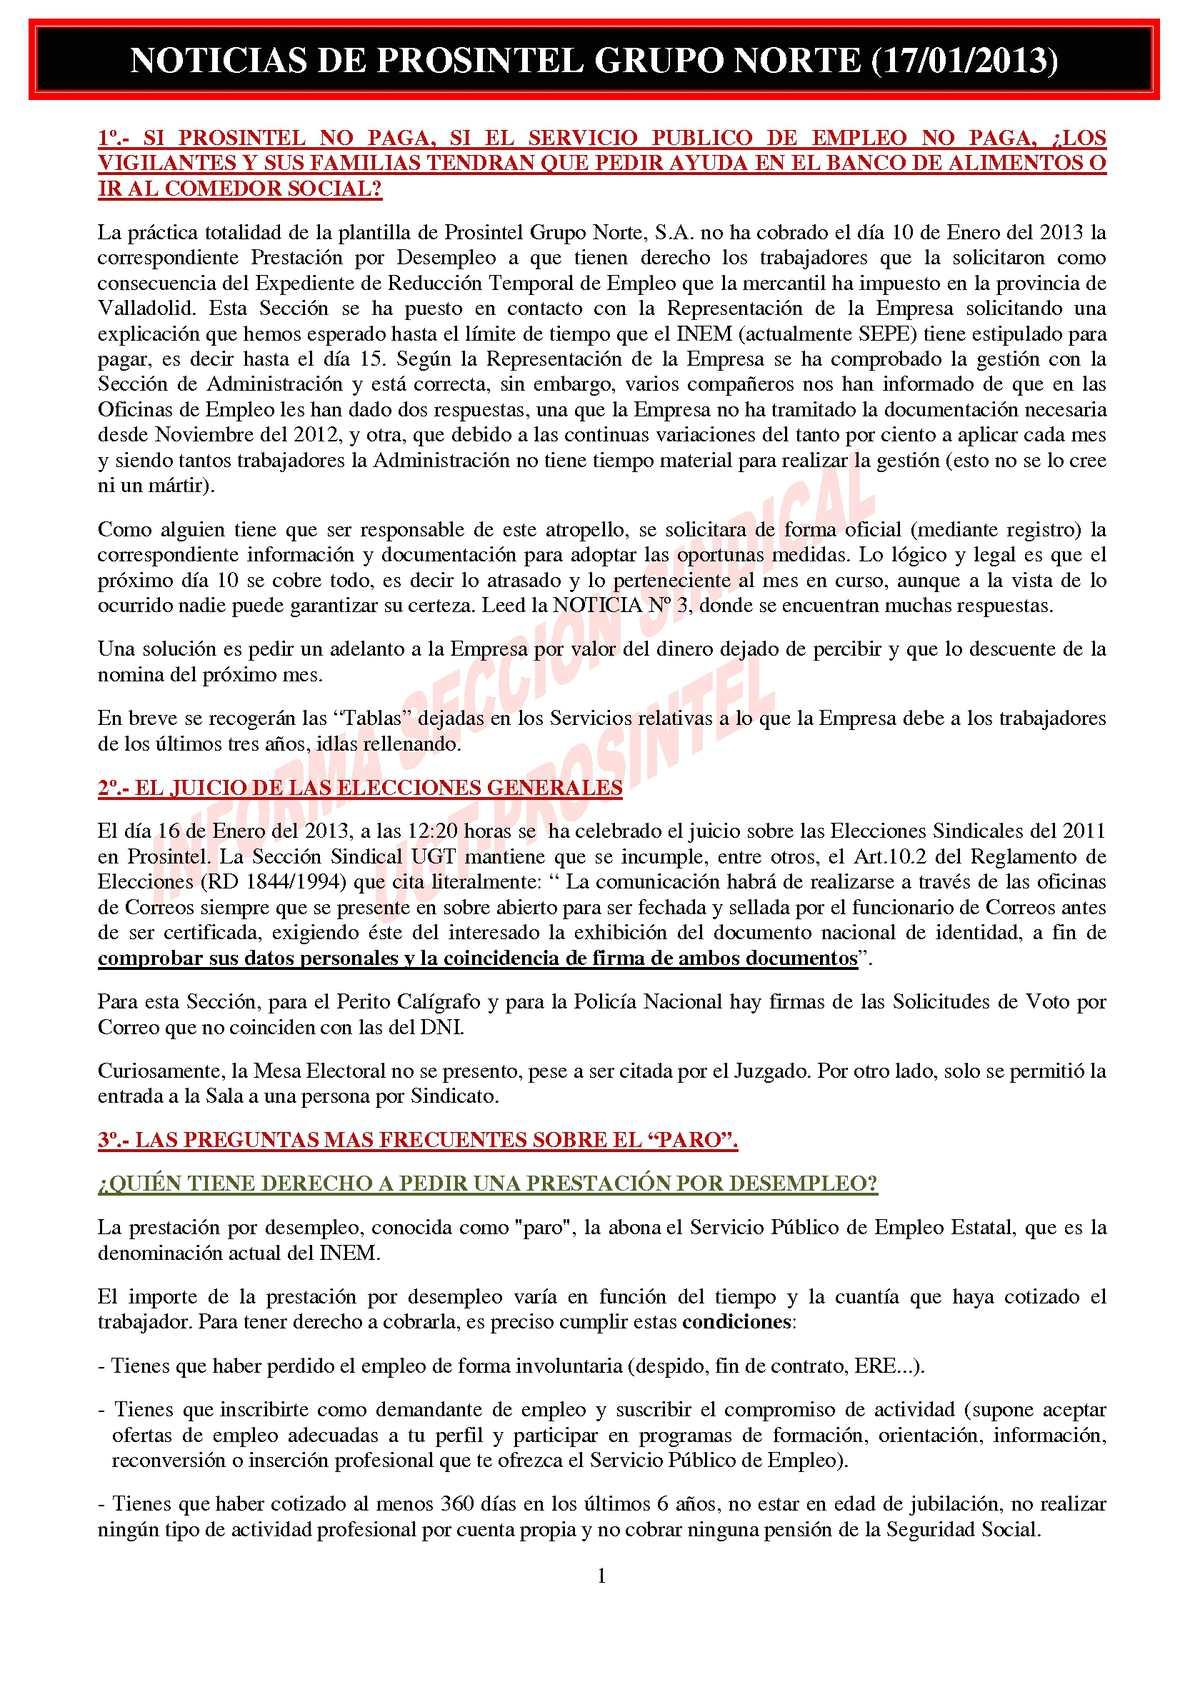 Calaméo - NOTICIAS DE PROSINTEL GRUPO NORTE (17/01/2013)